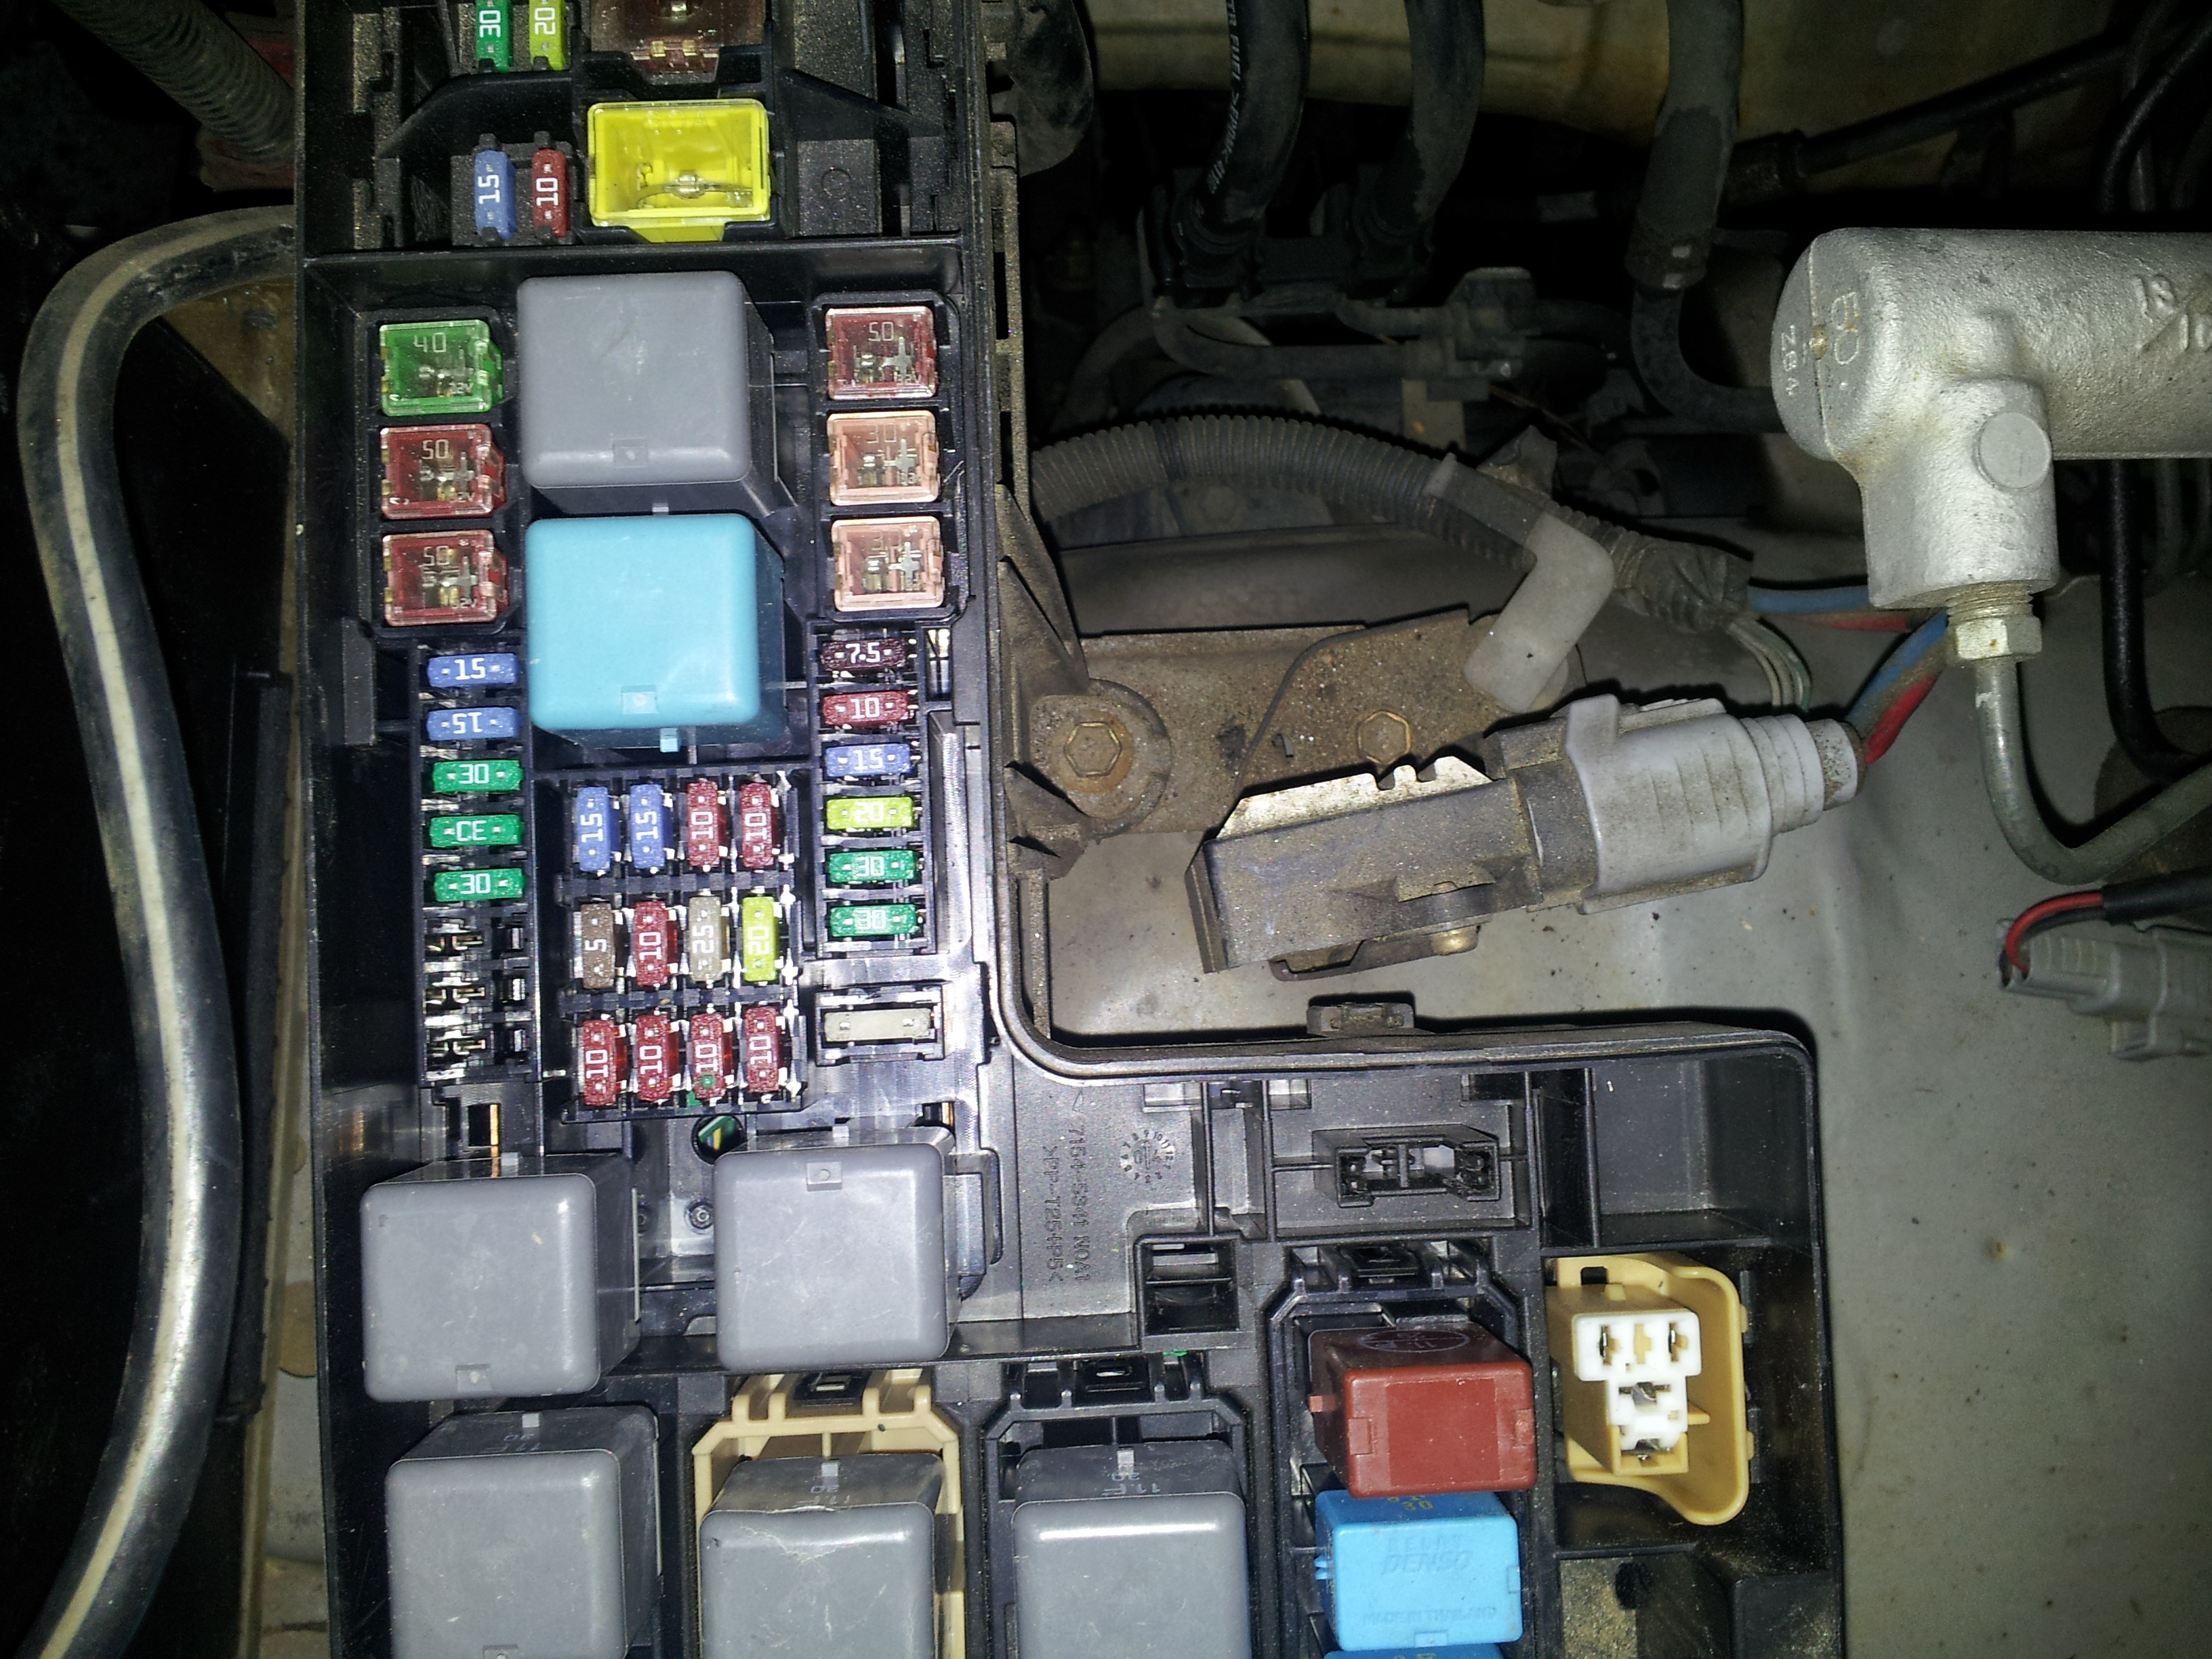 Toyota Echo Fuse Box Key Auto Electrical Wiring Diagram 2009 Corolla 1995 4runner